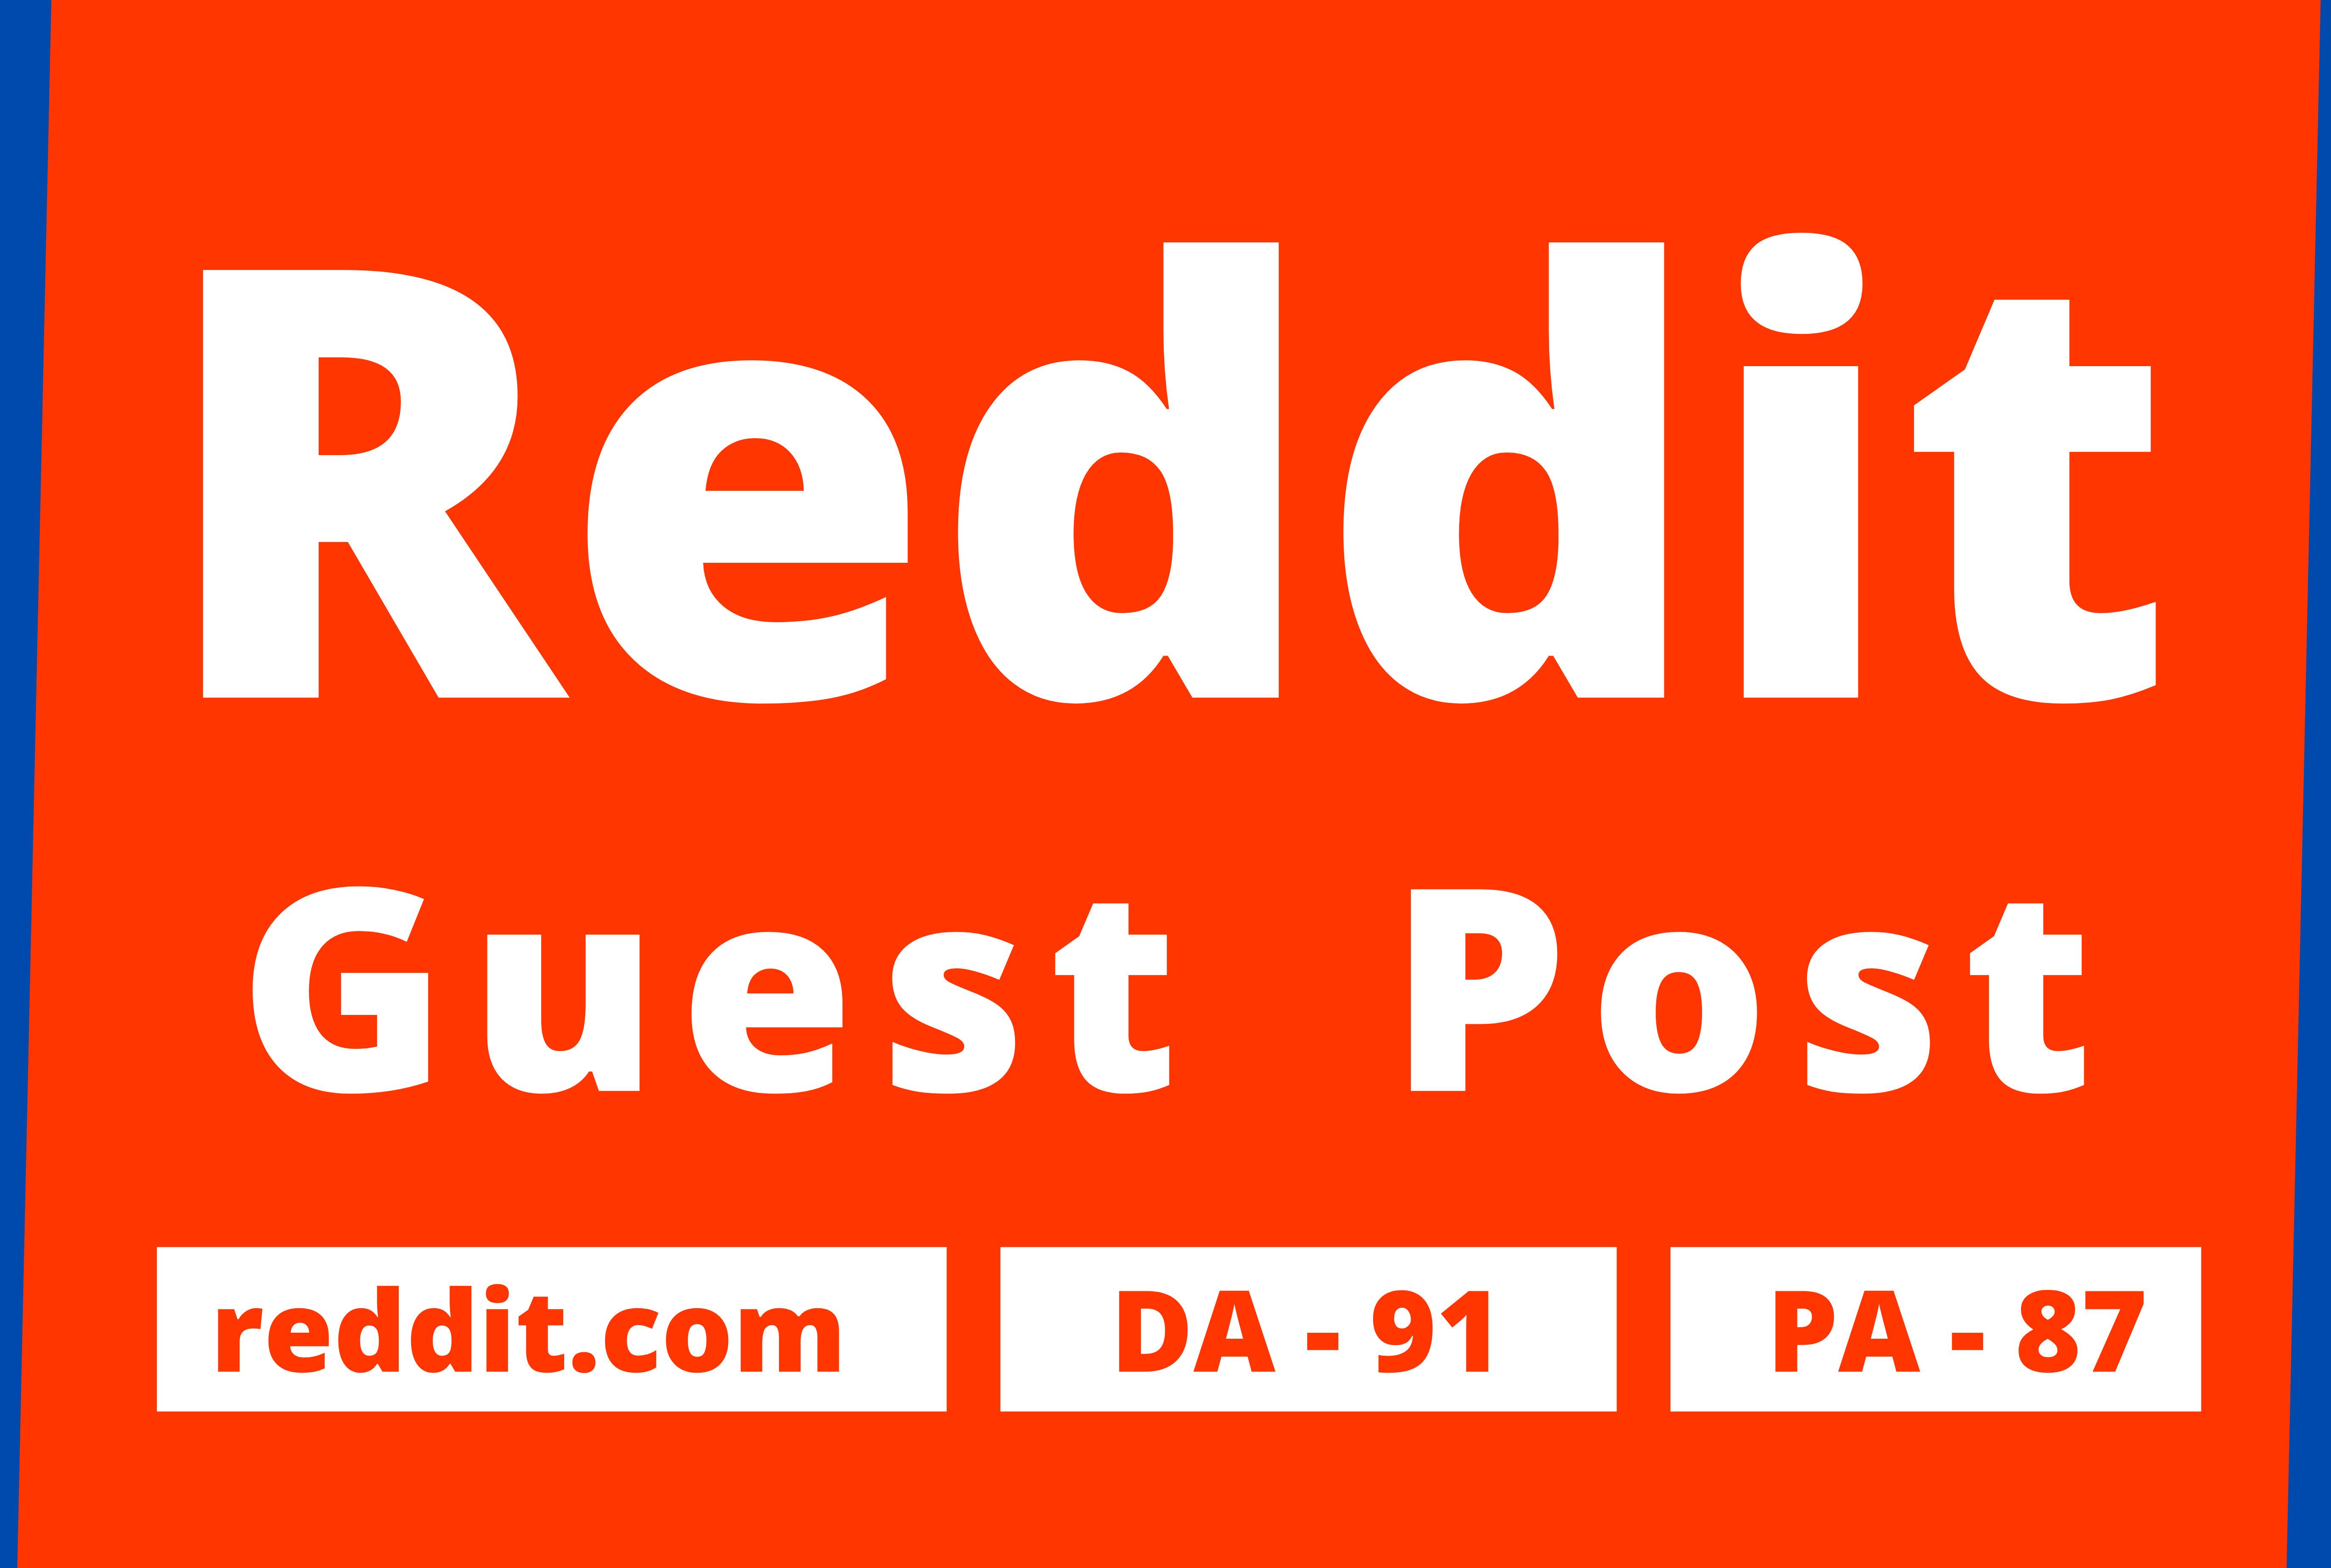 Promote Website by 10 High Quality Reddit Guest Post Backlink